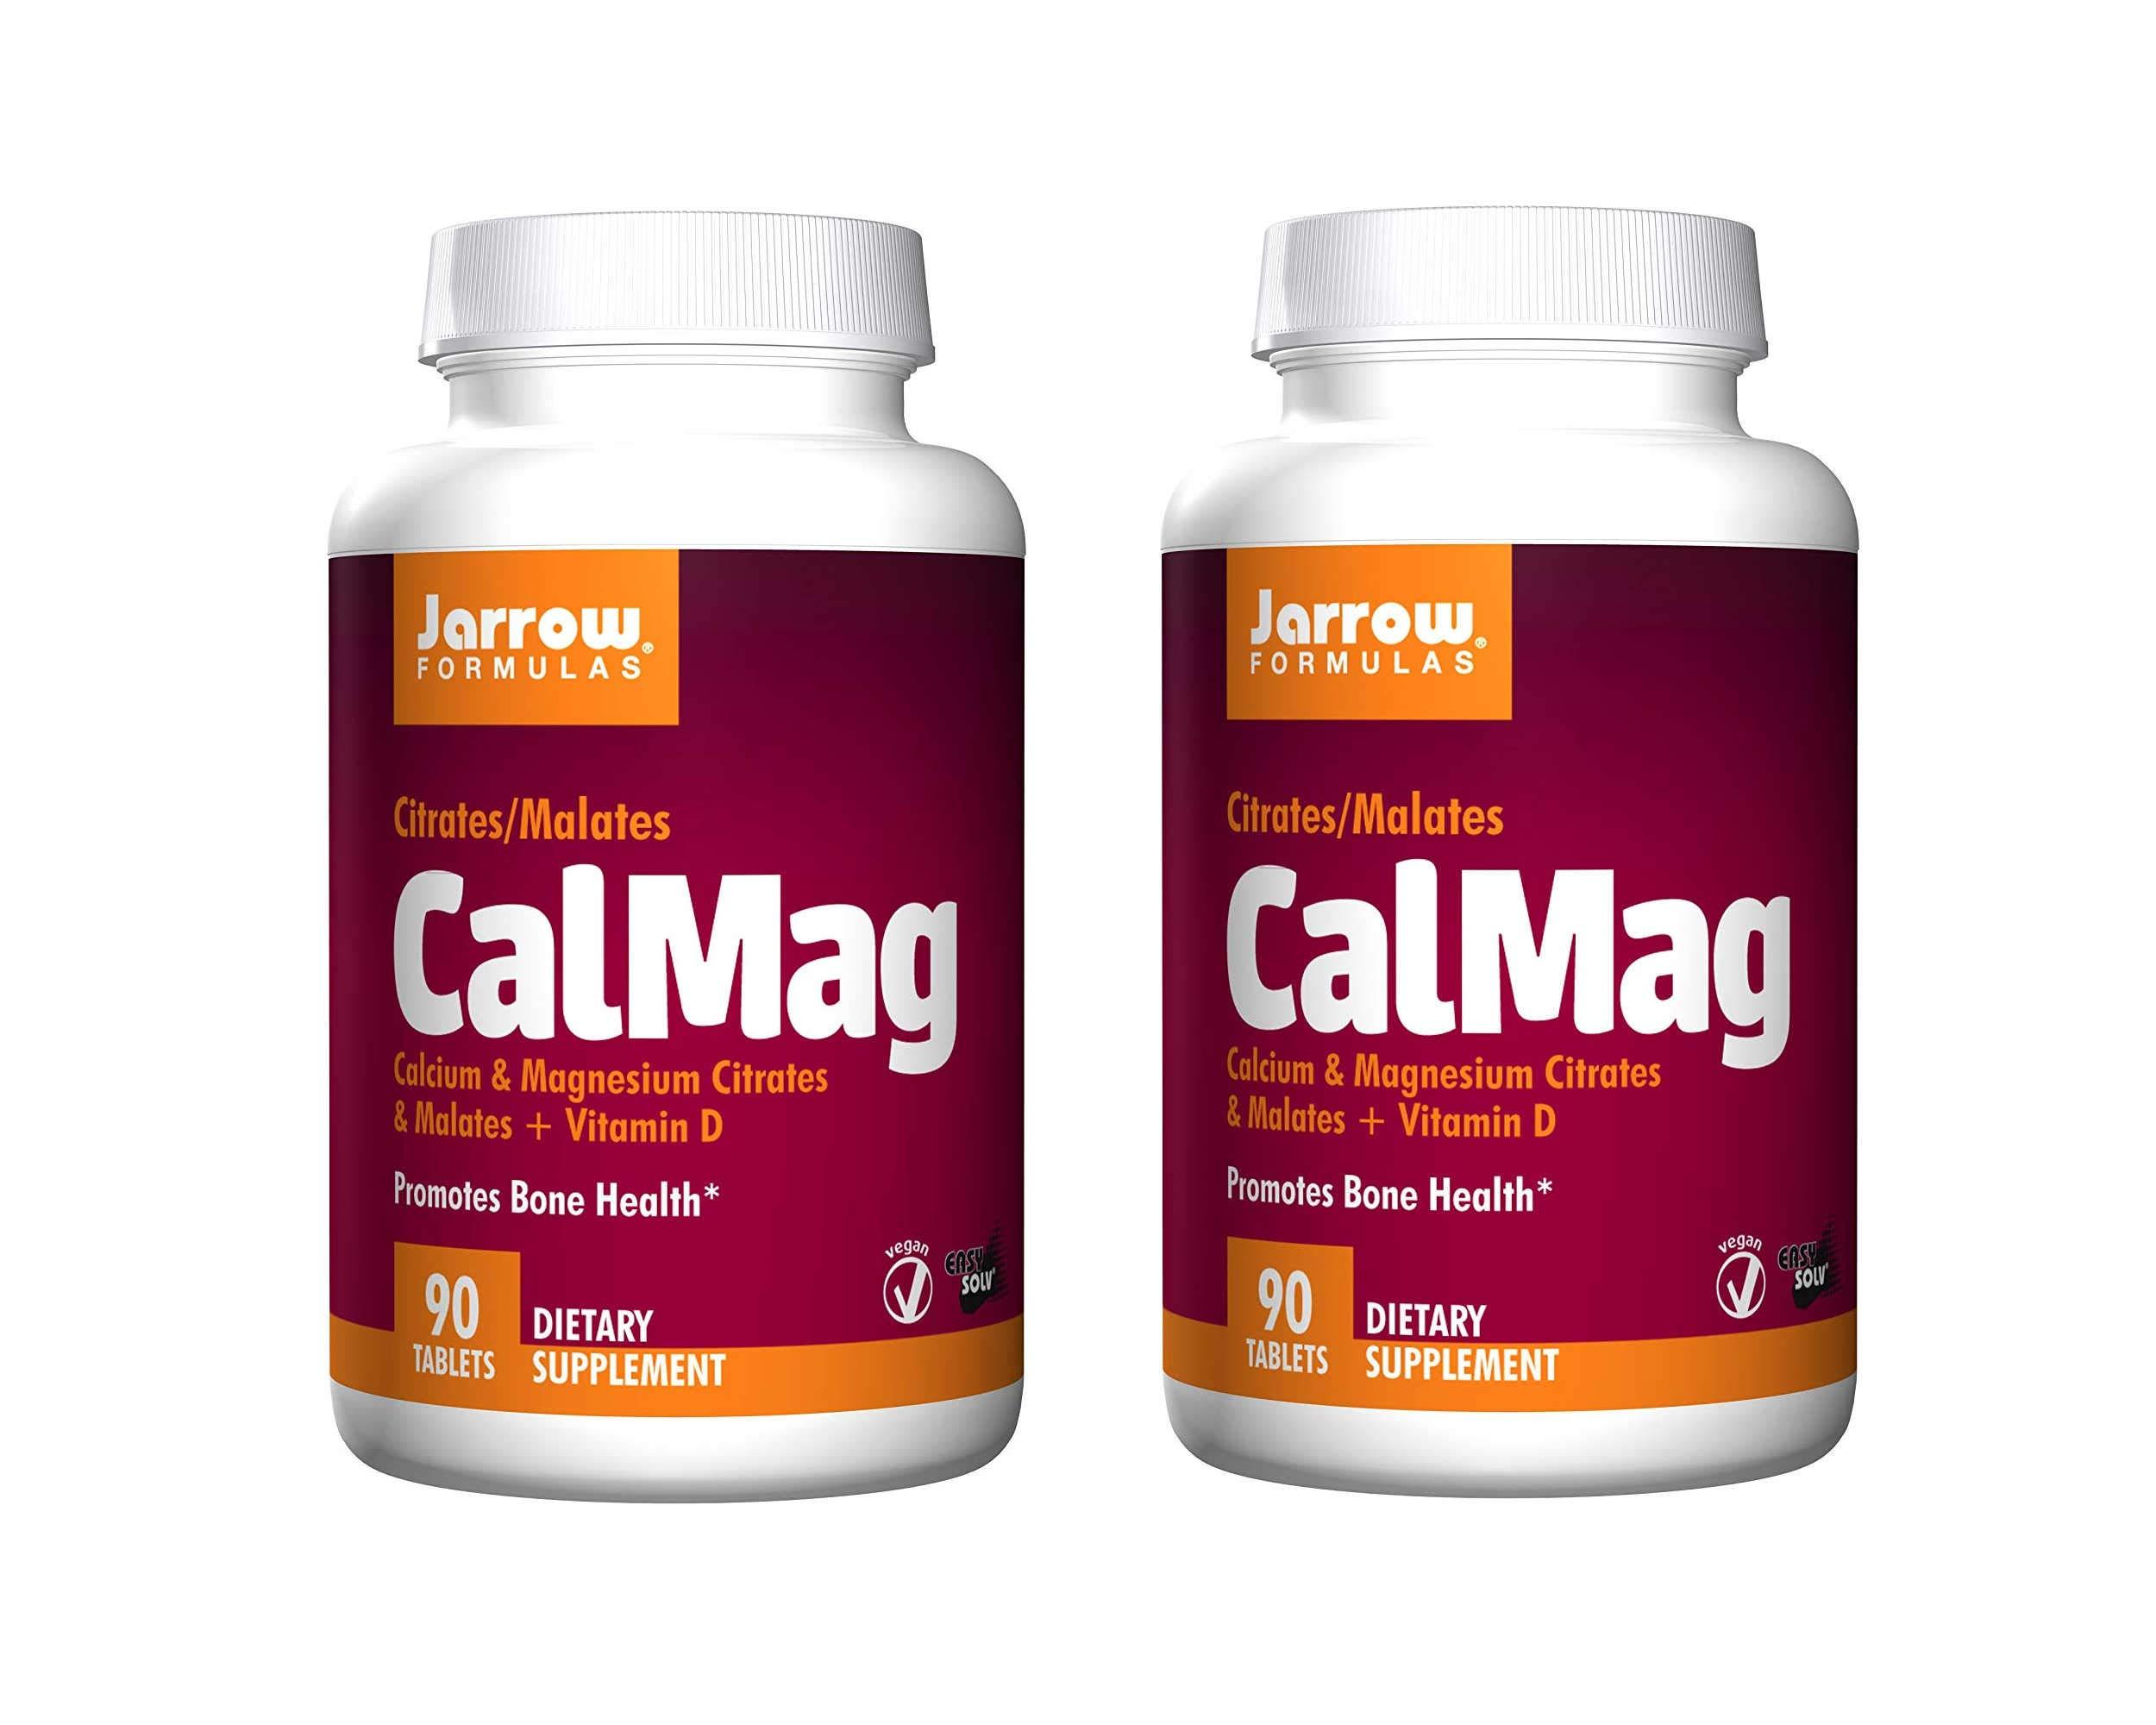 Jarrow Formulas CalMag Calcium Magnesium Citrates and Malates Plus Vitamin D Promotes Bone Health Vegan Dietary Supplement - 90 Tablets (Pack of 2) by JARR0W